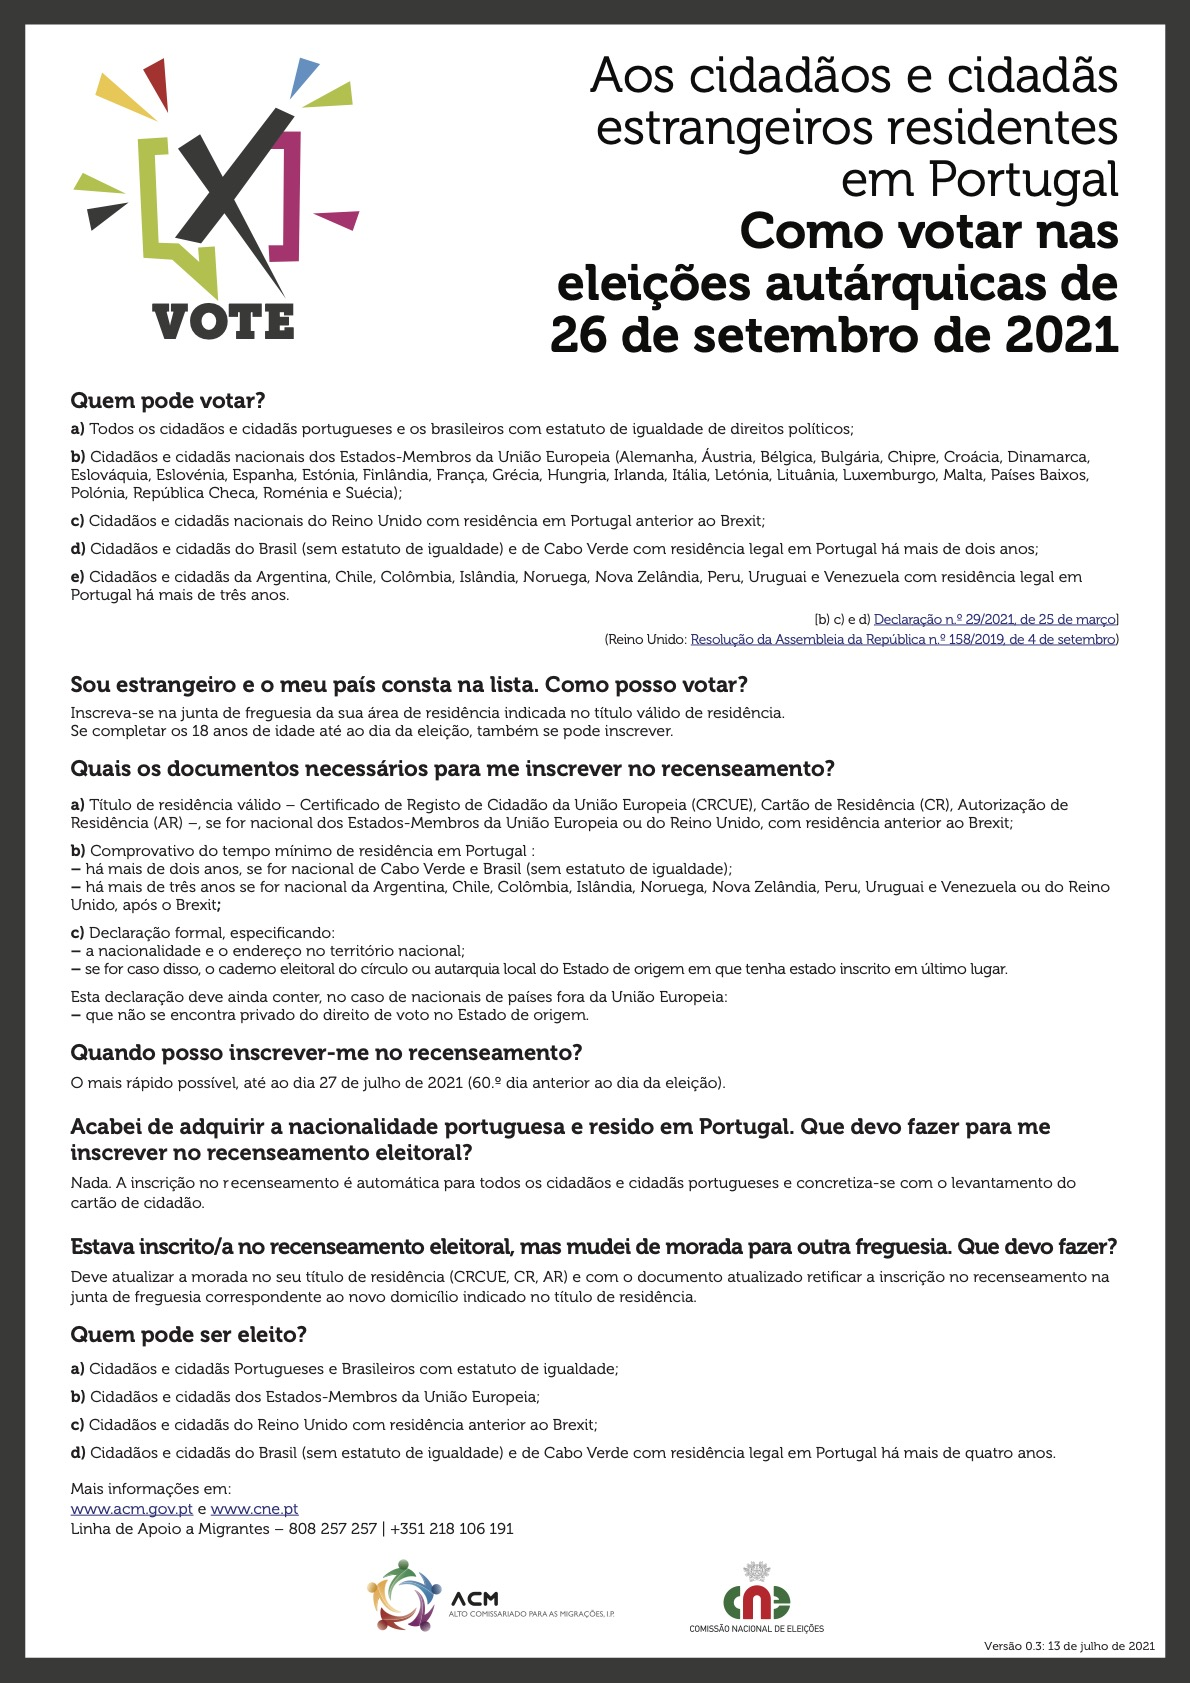 Flyer_Participacao_Civica_Portugues